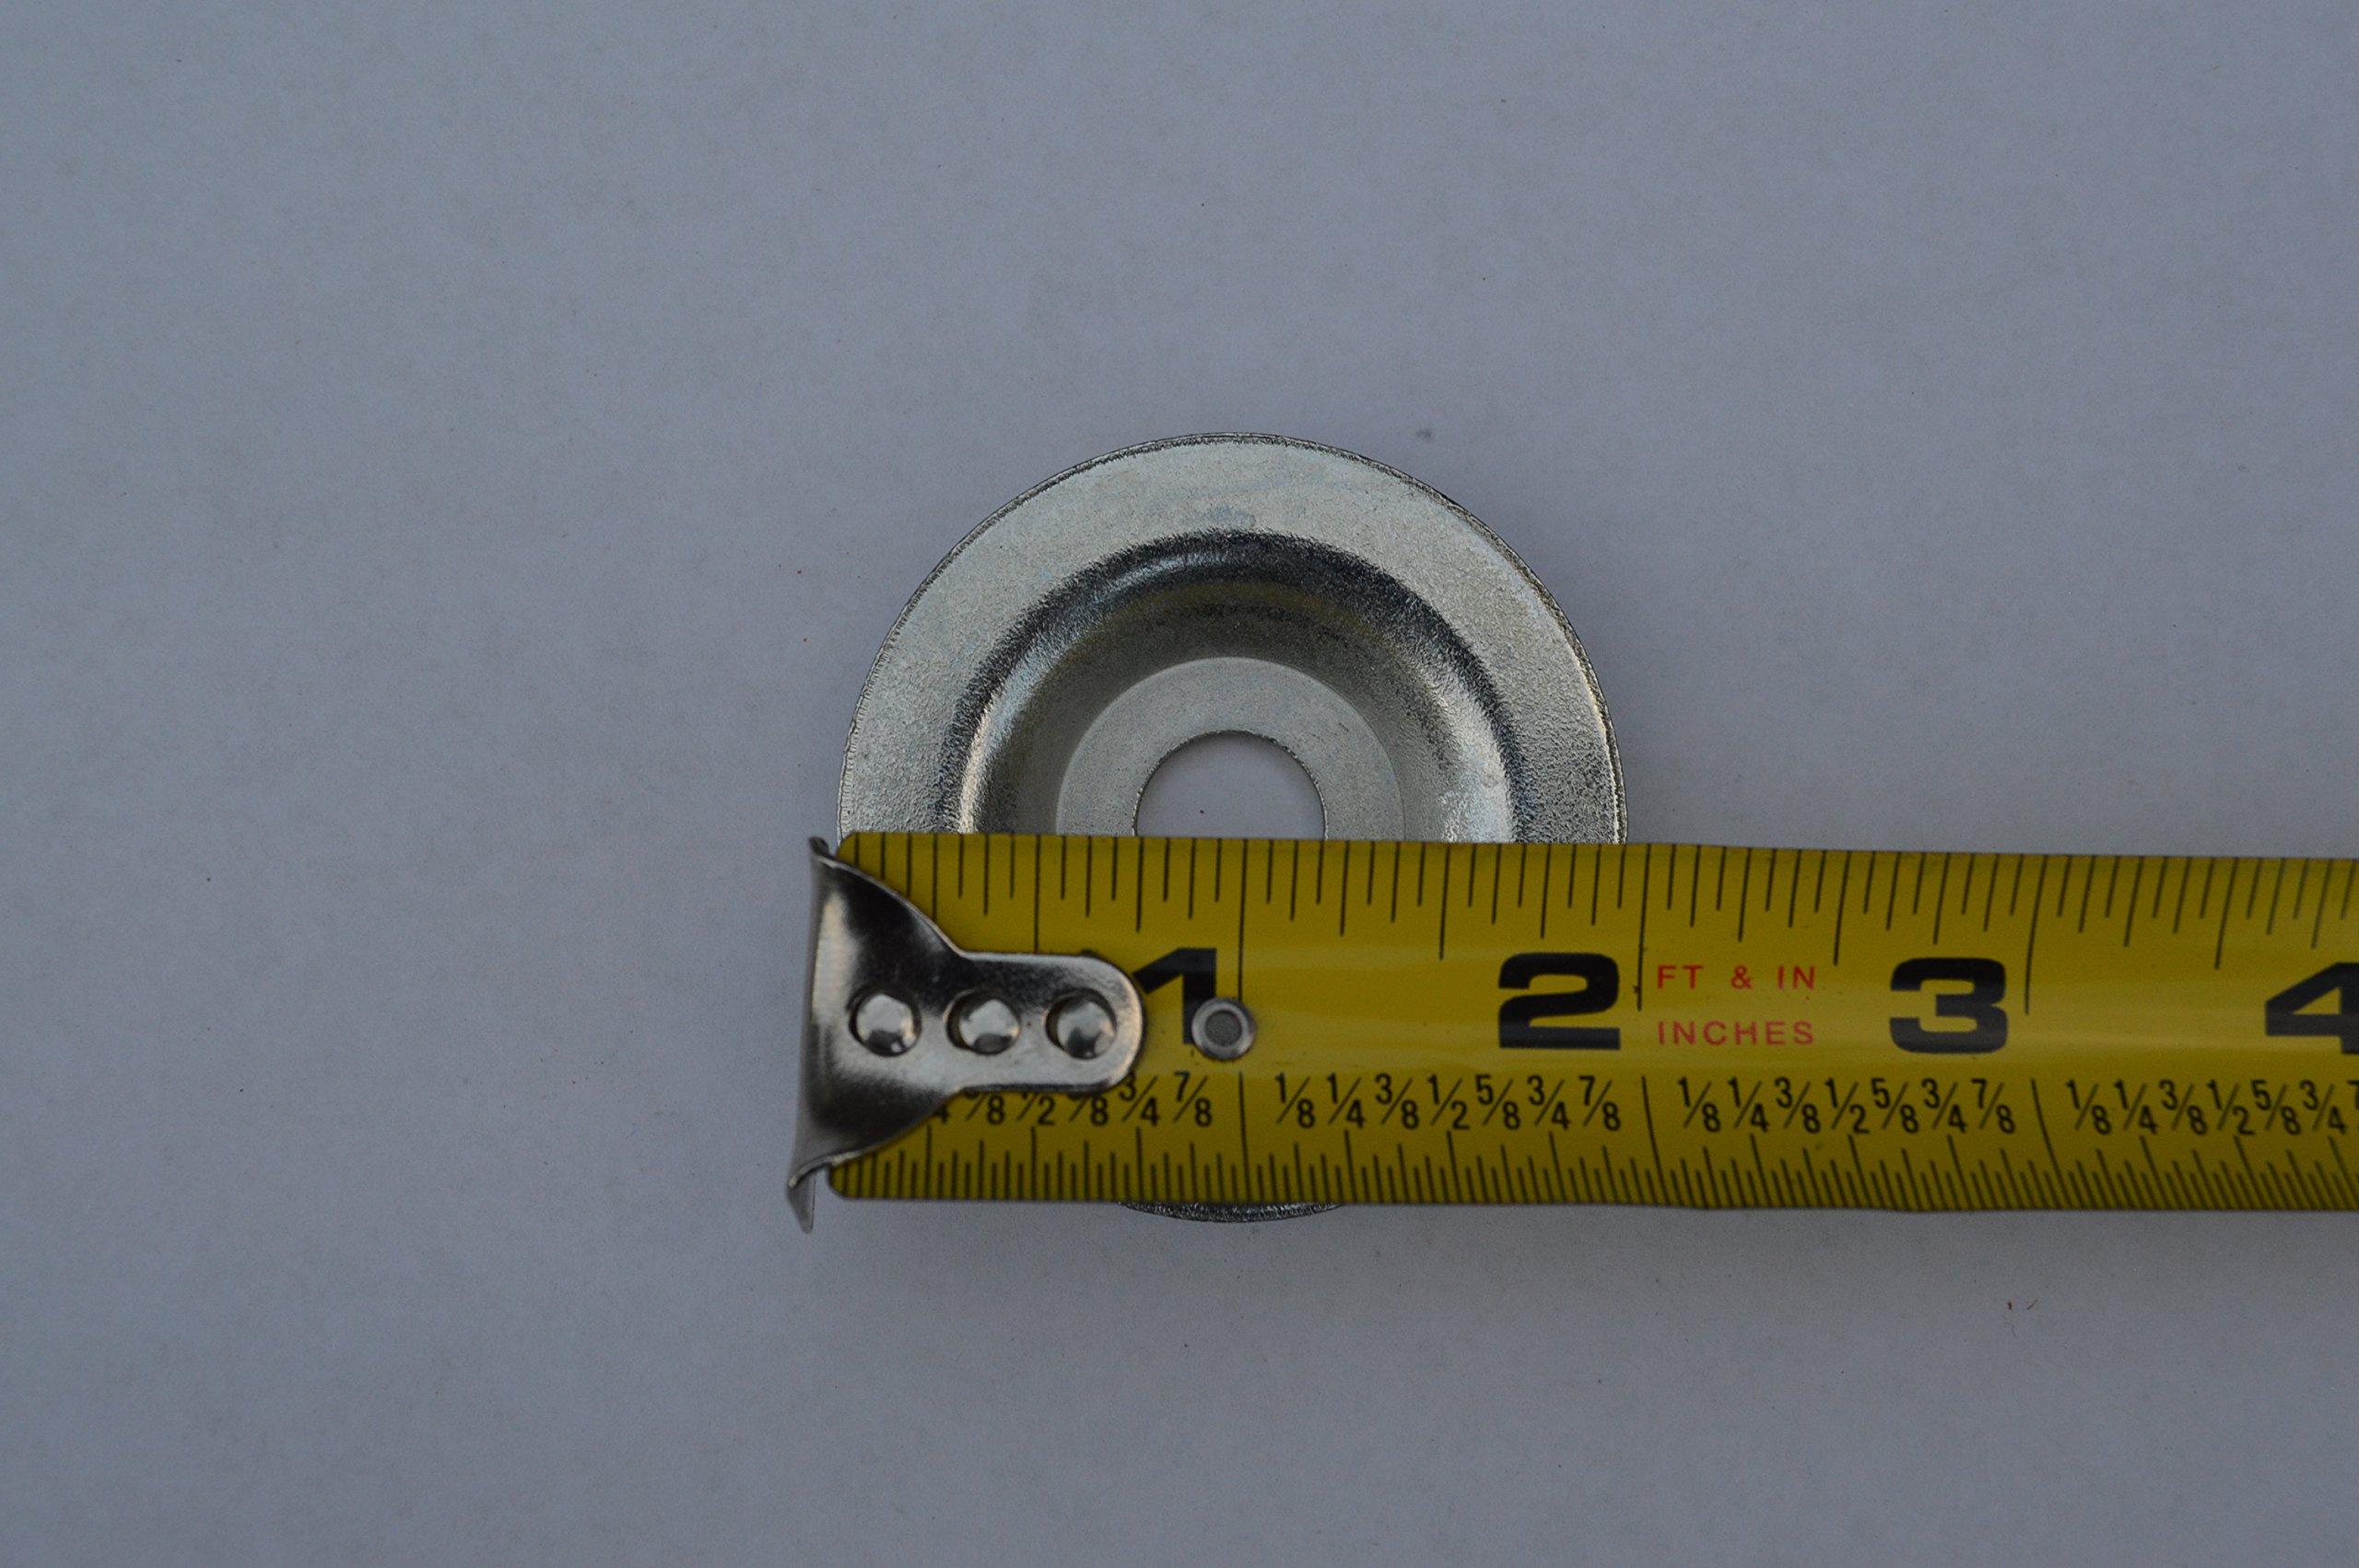 4, 2''bench Grinder Arbor Washer/flange/collar,1/2''arbor Grinding/wire Wheel by Gitachi (Image #3)